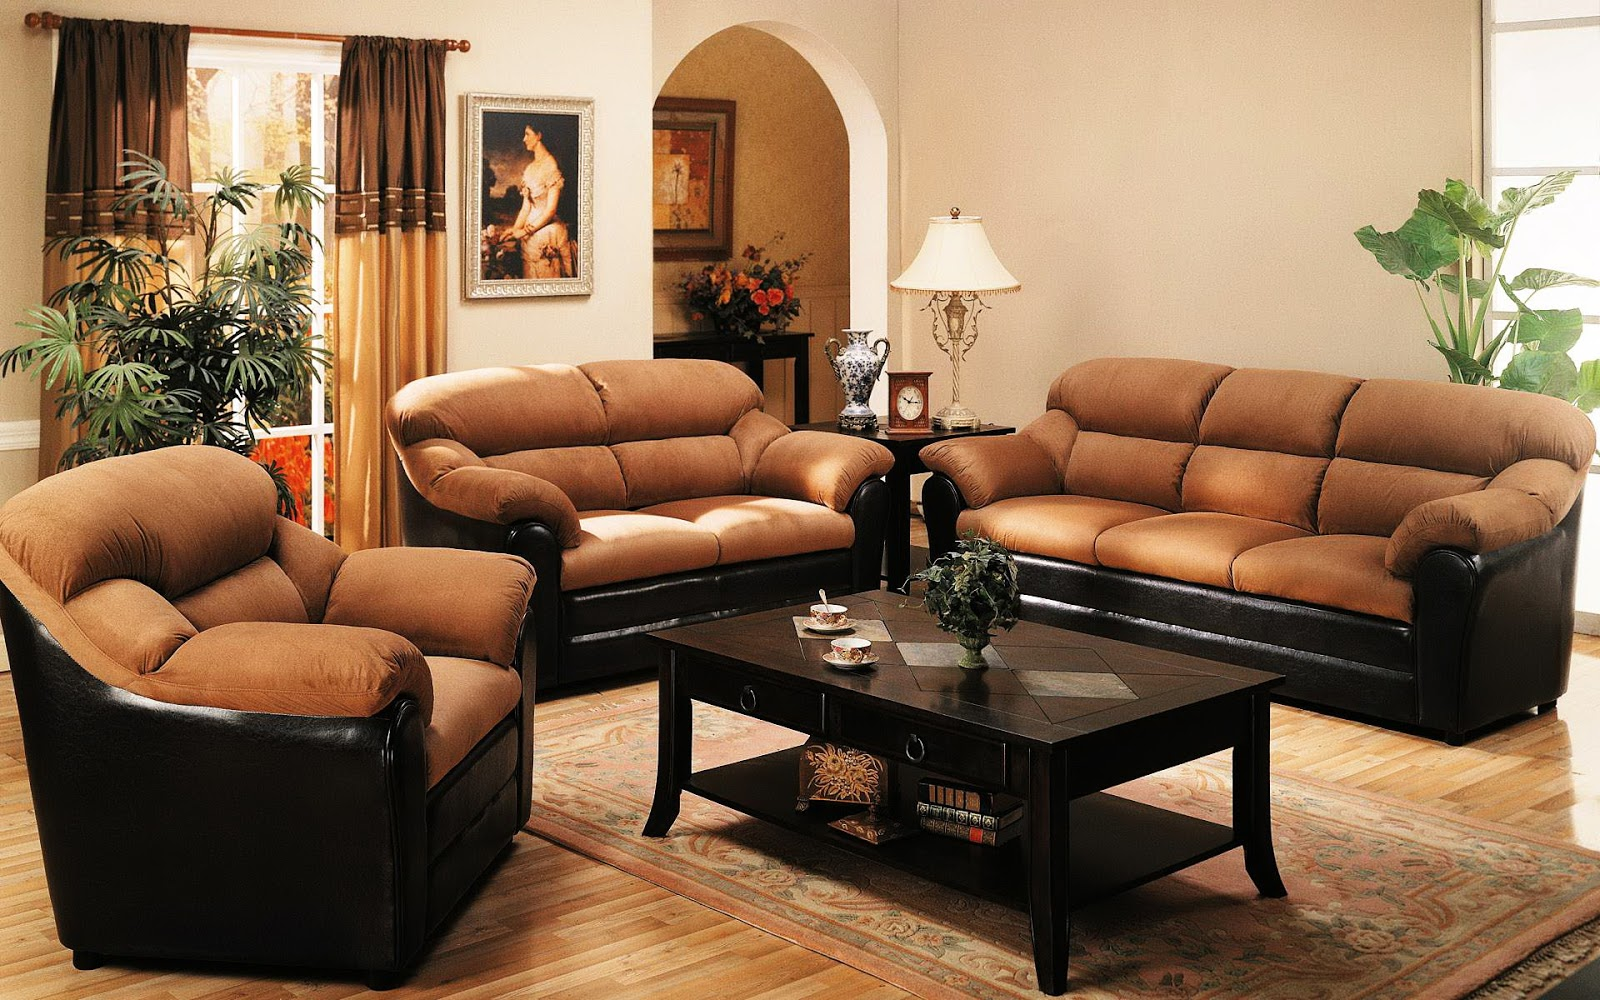 renovating old furniture. new life of old furniture 5 design master classes renovating s